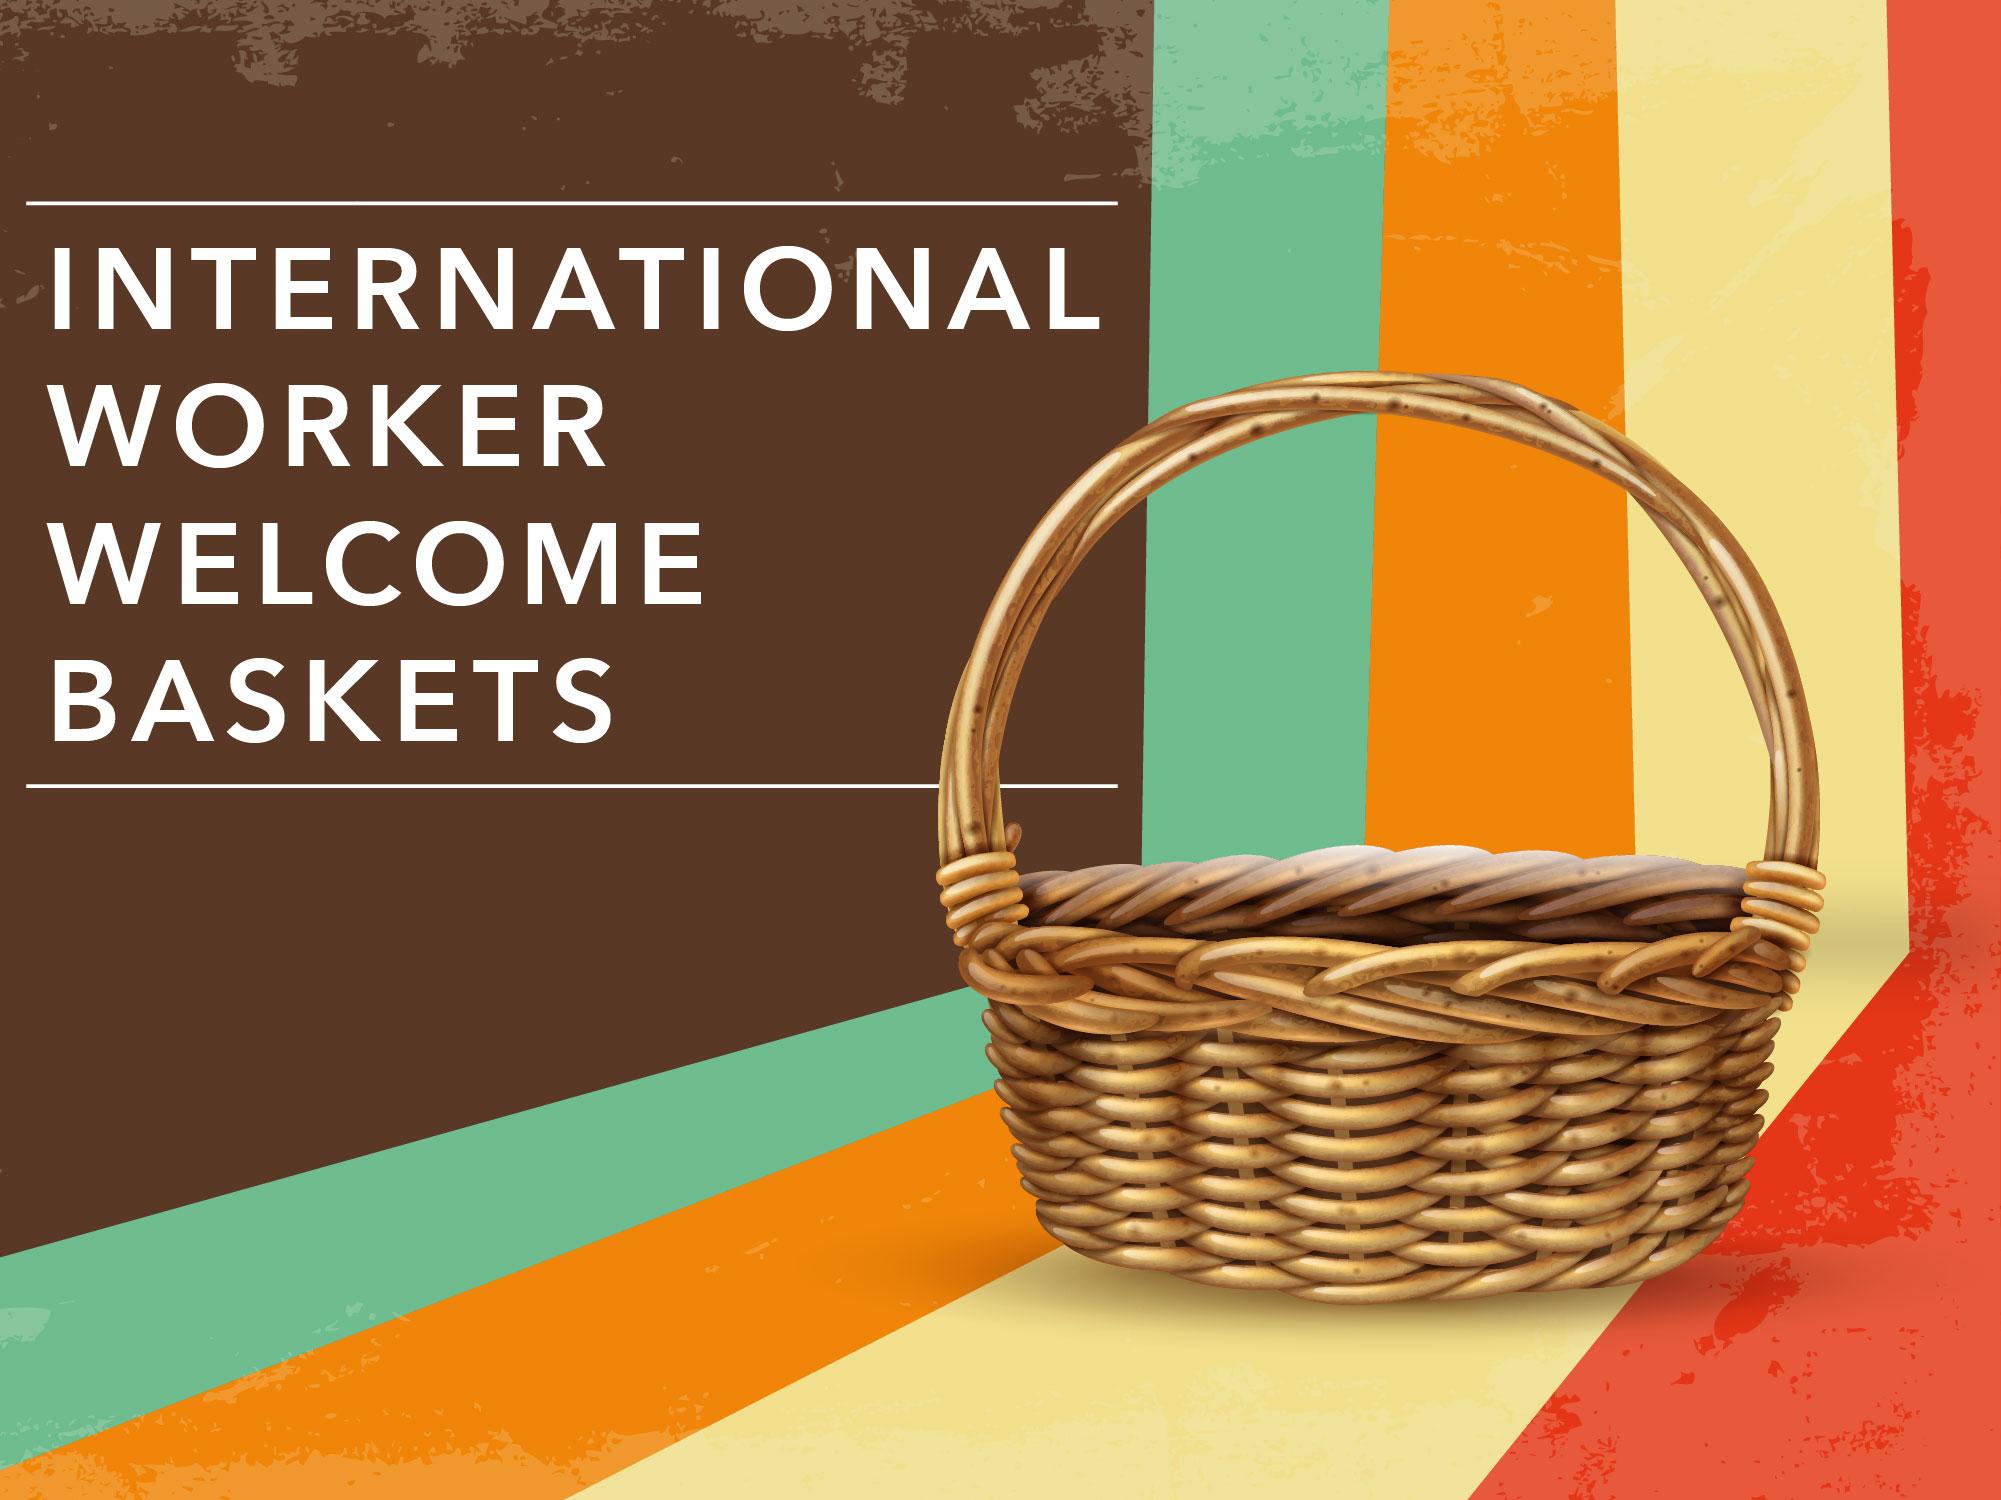 welcome baskets-01.jpg